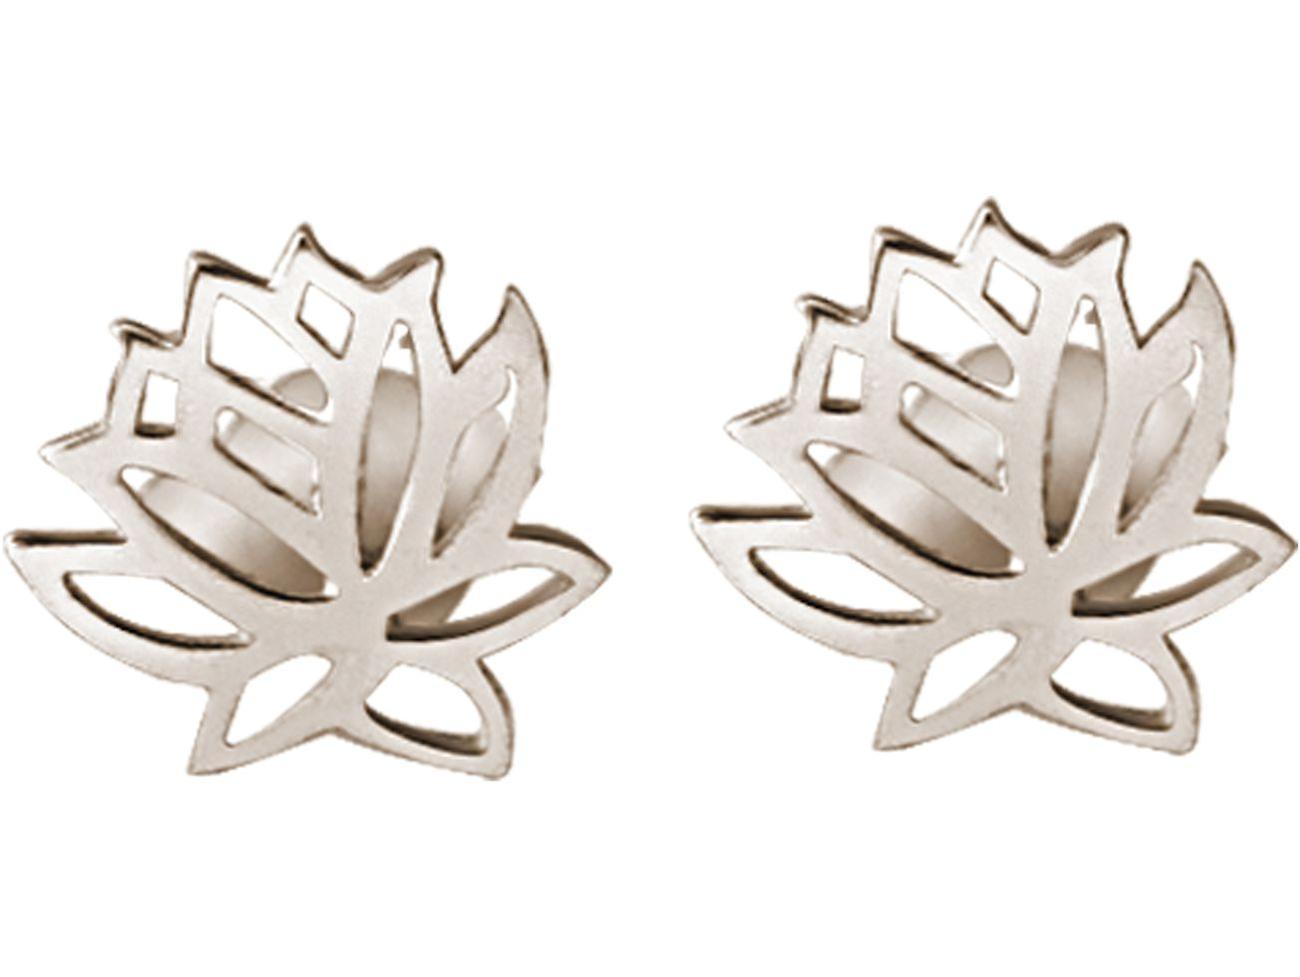 Gemshine Ohrringe Lotusblumen Ohrstecker in 925 Silber, vergoldet oder rose